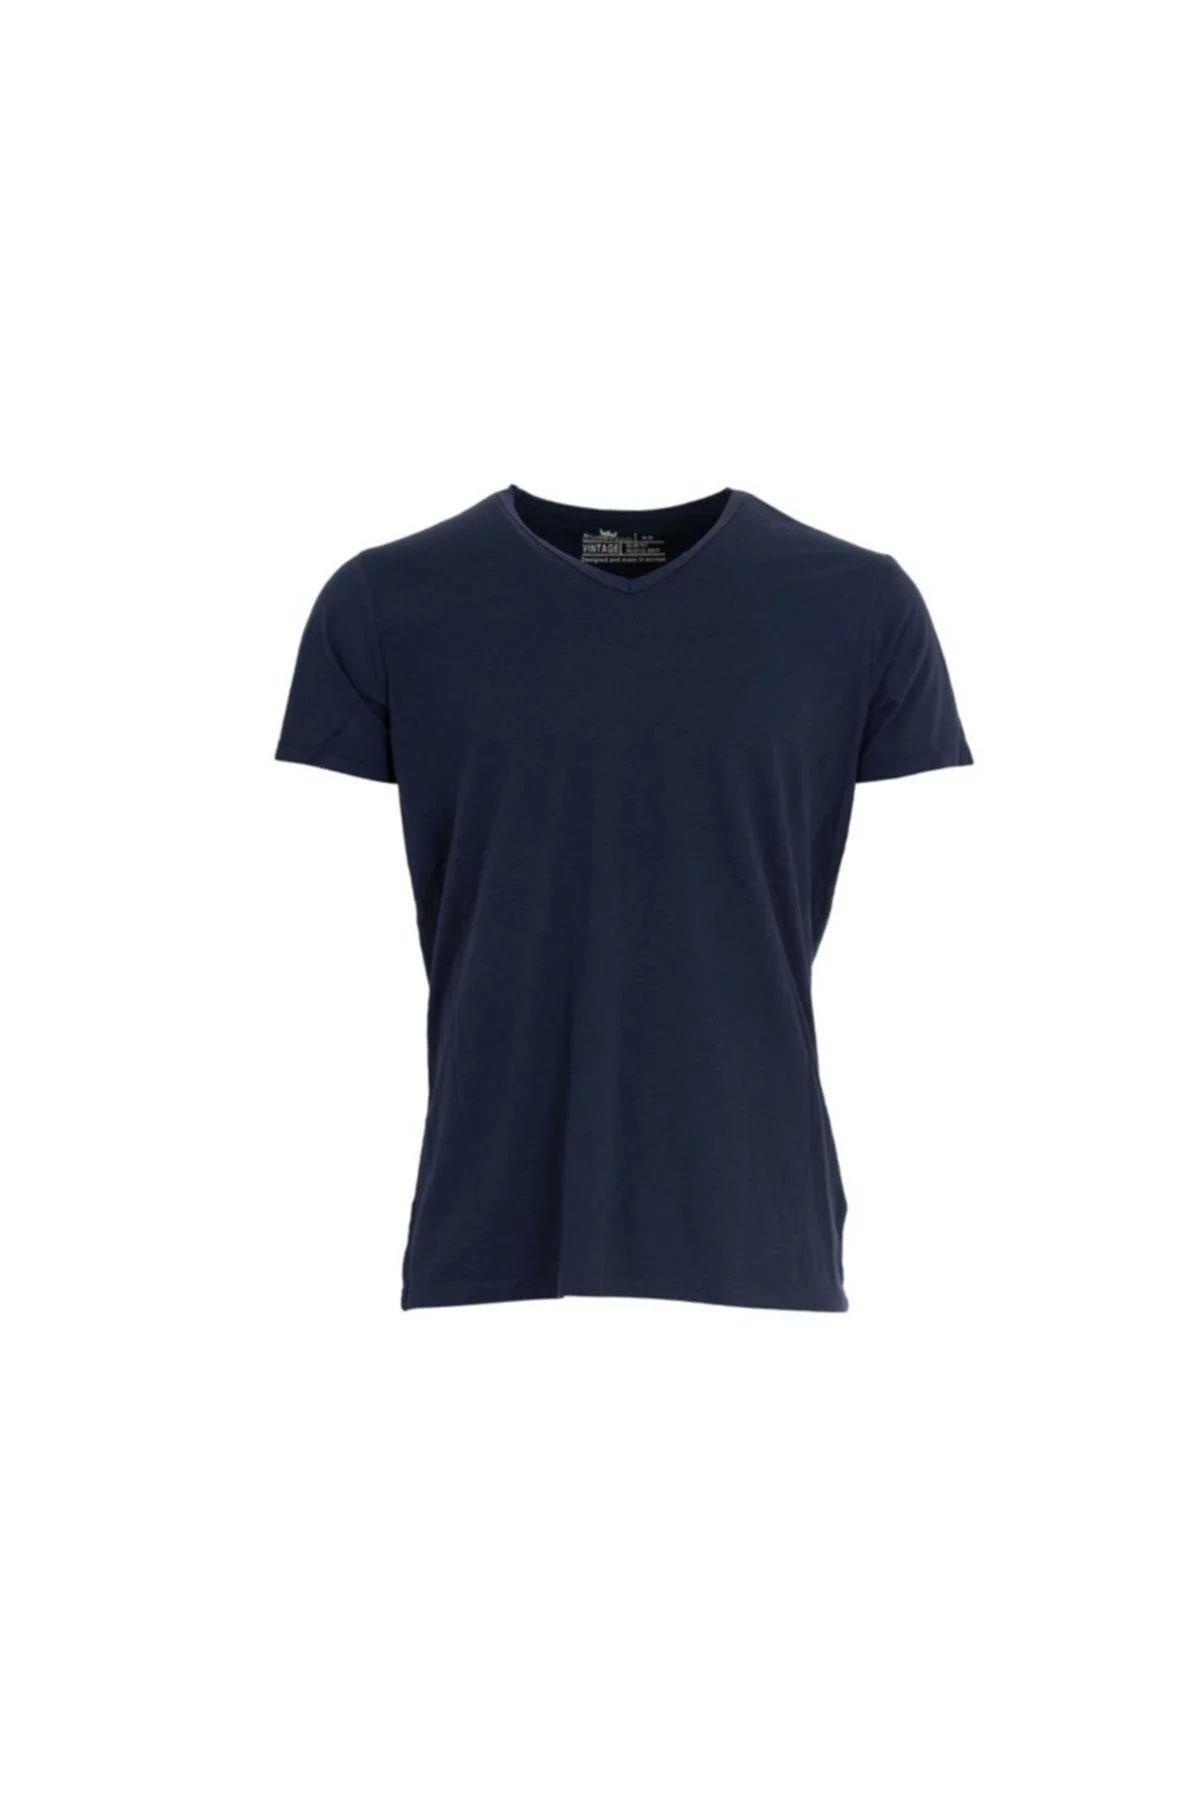 Superfly Erkek T-Shirt SPF101202045902